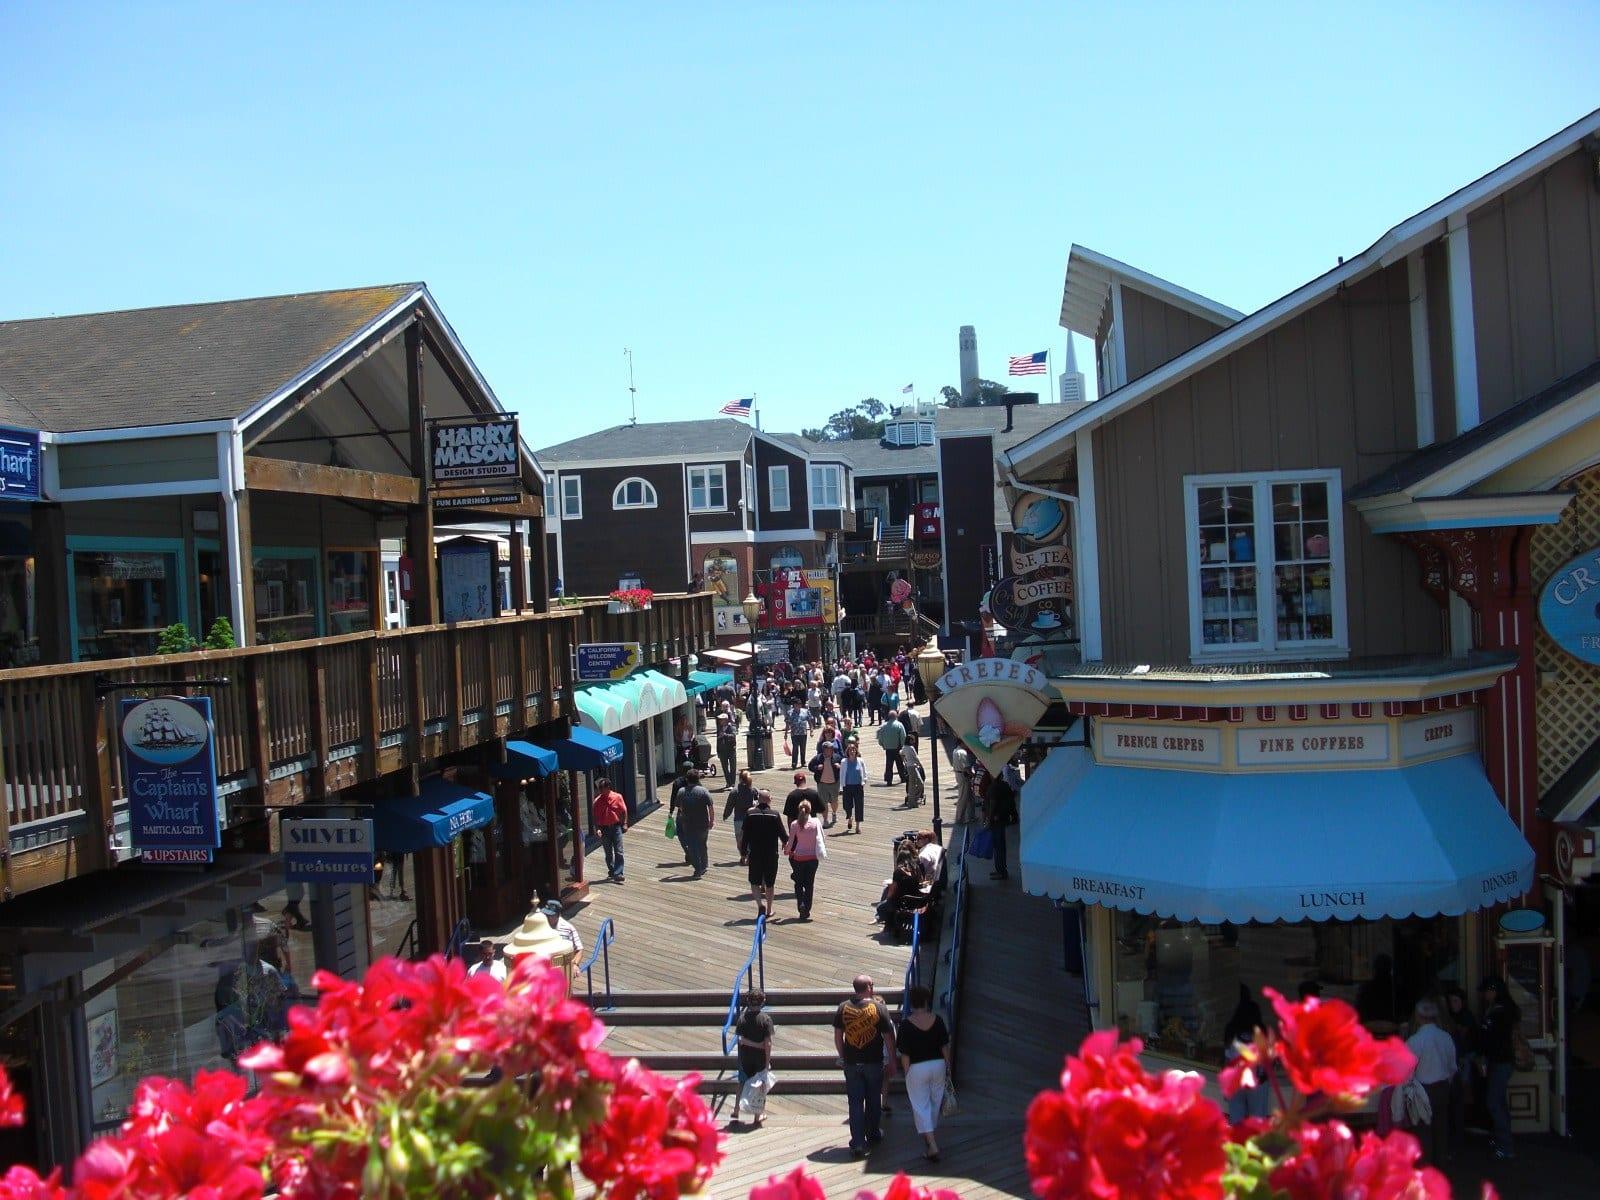 San Francisco's Pier 39